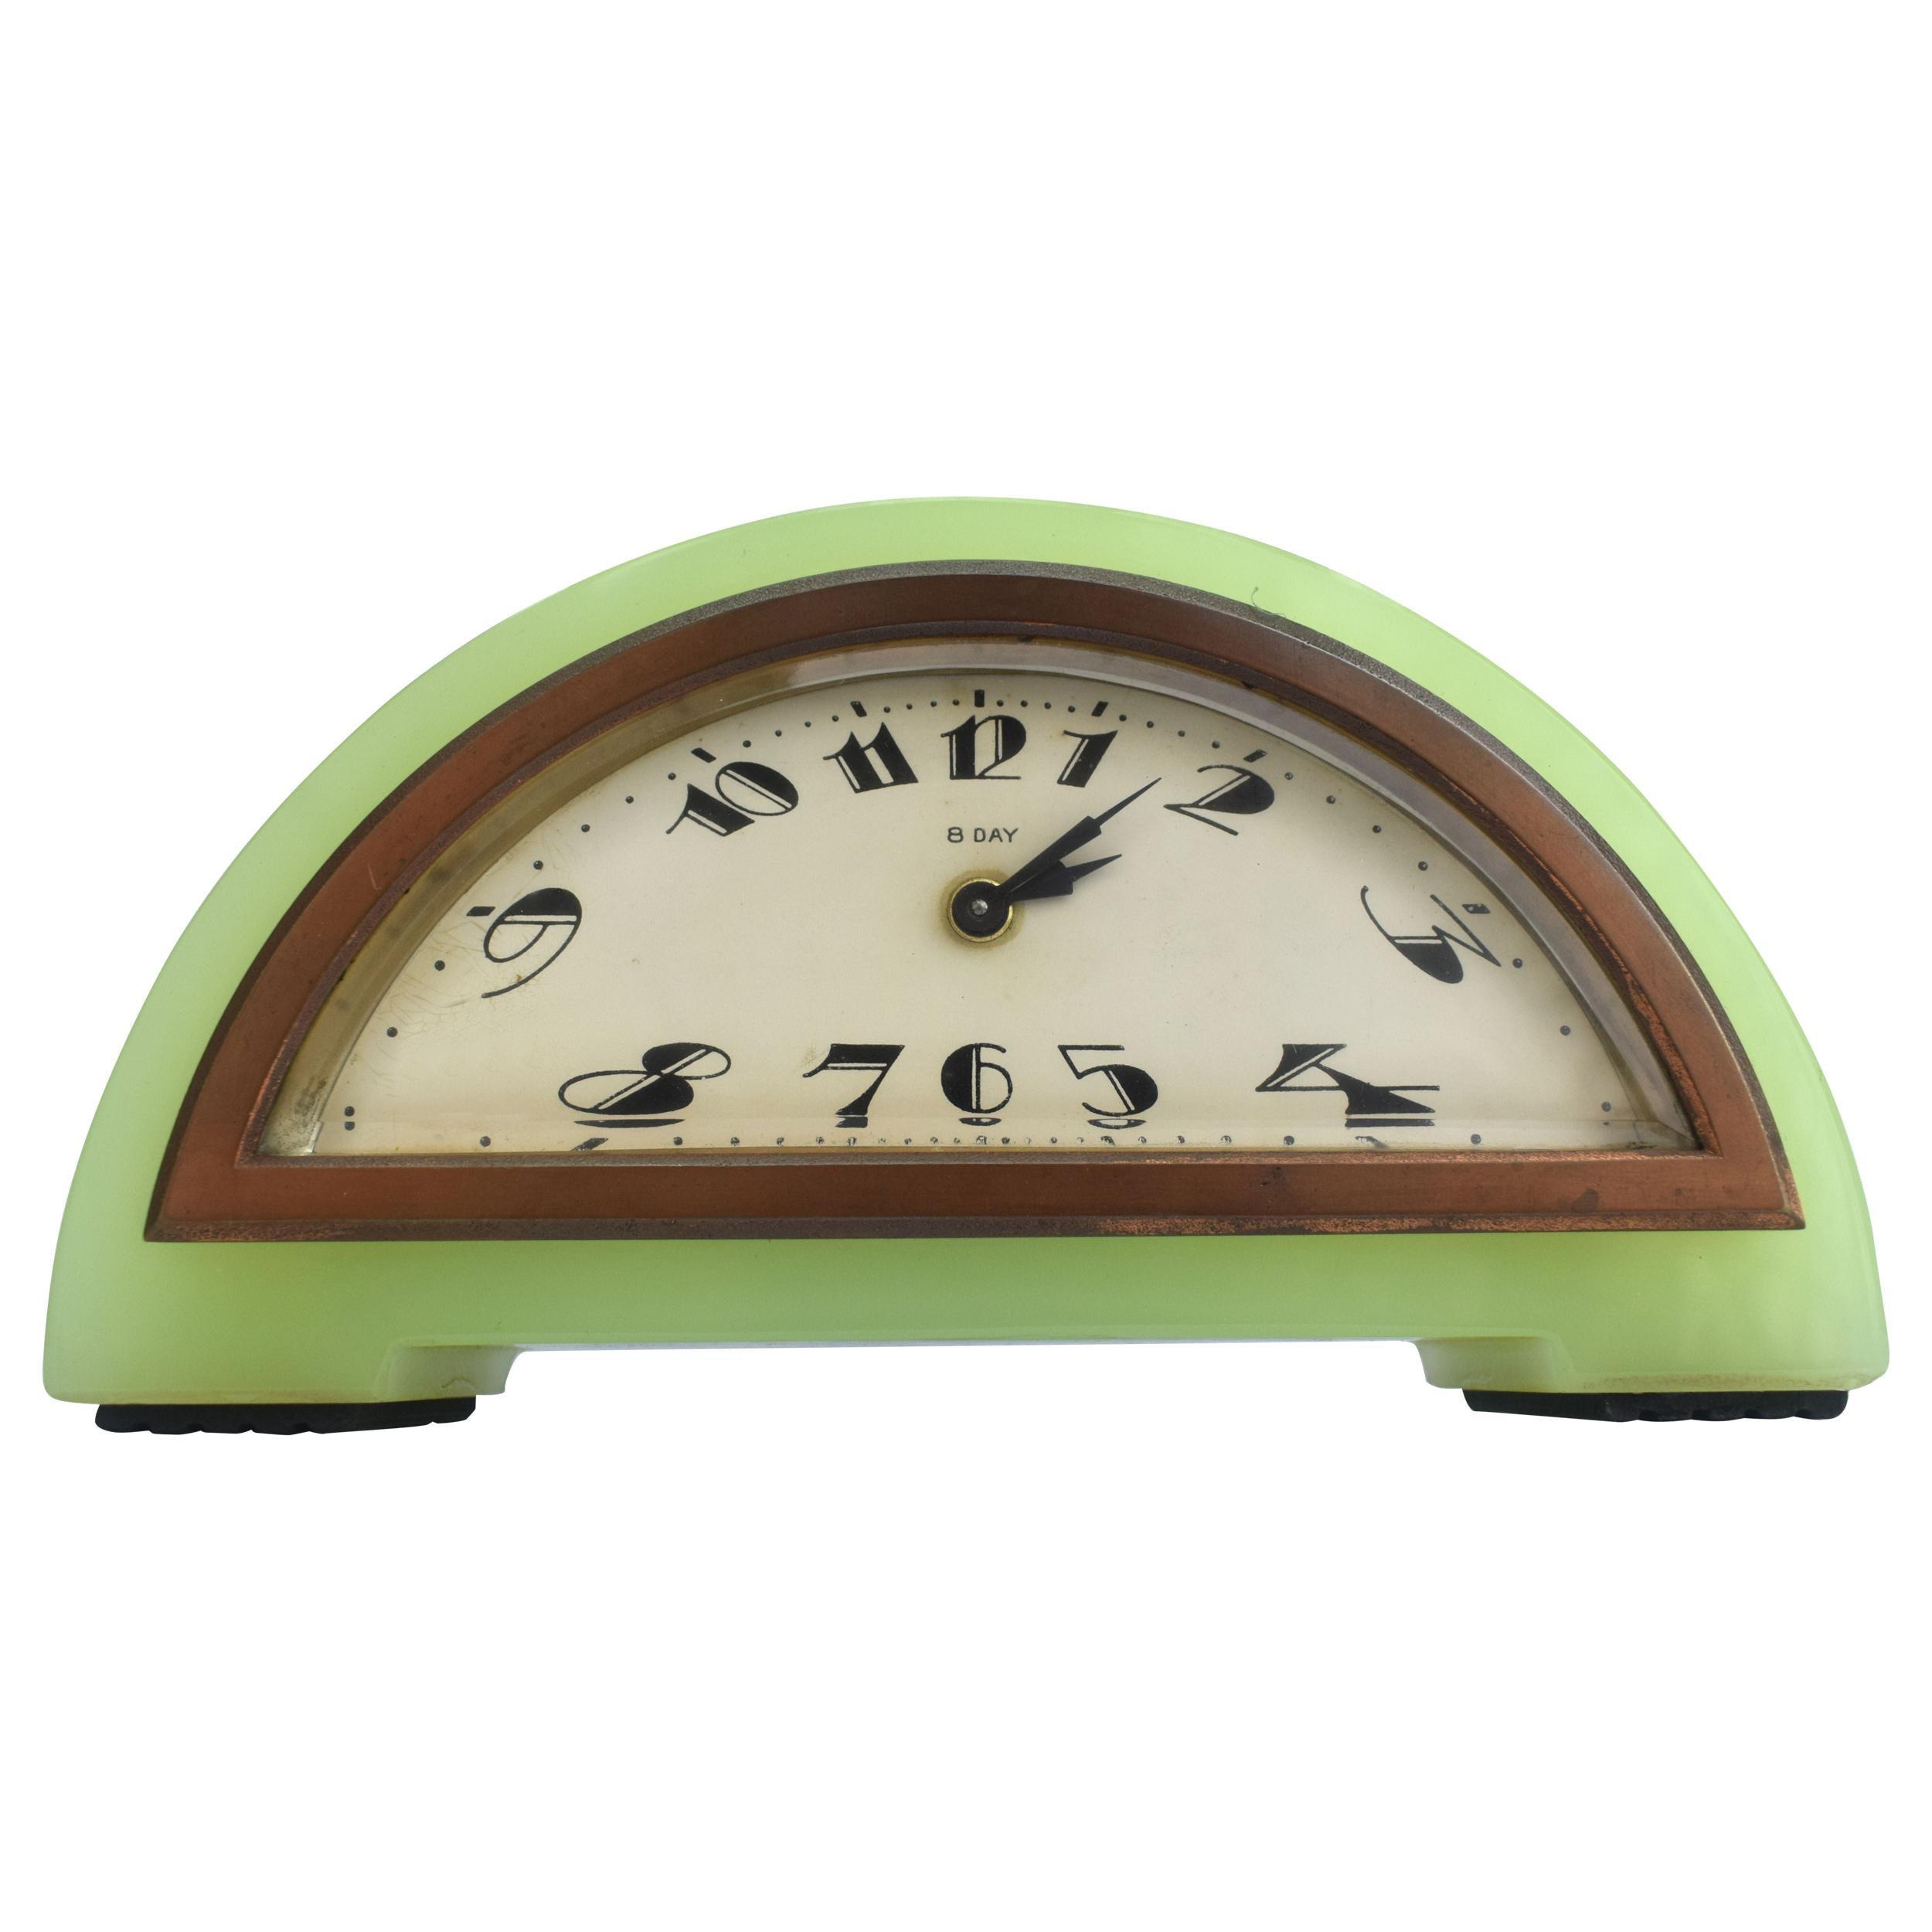 Art Deco Green Onyx 8 Day Mantle Clock, c1930